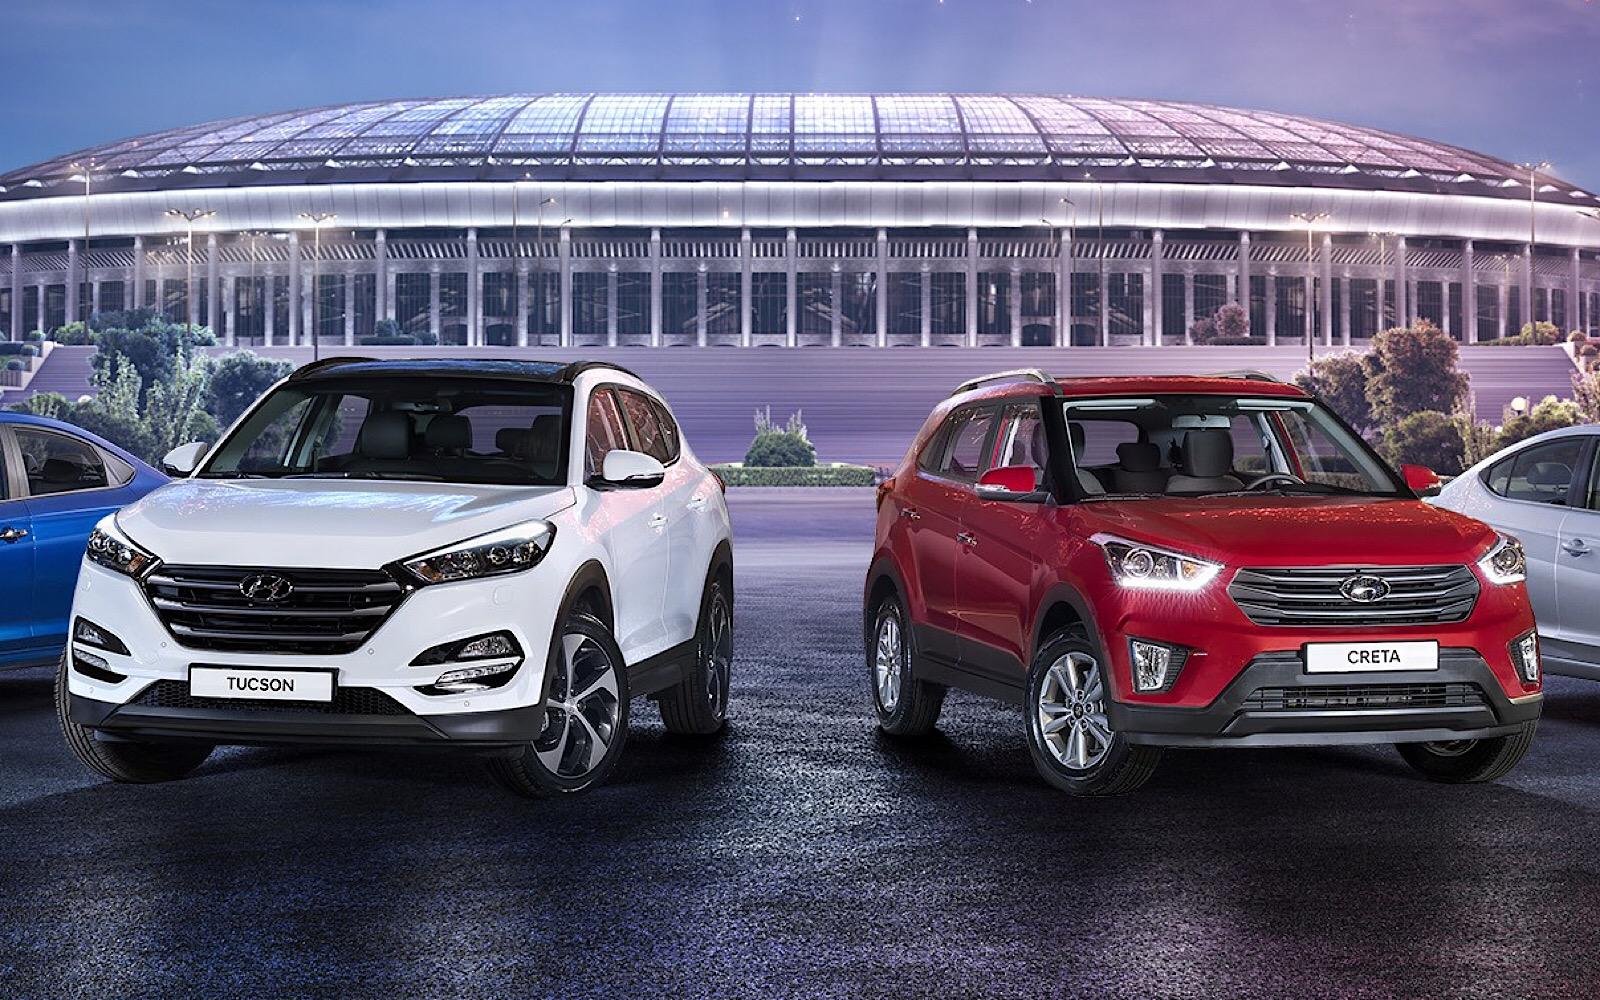 Hyundai FIFA 2018